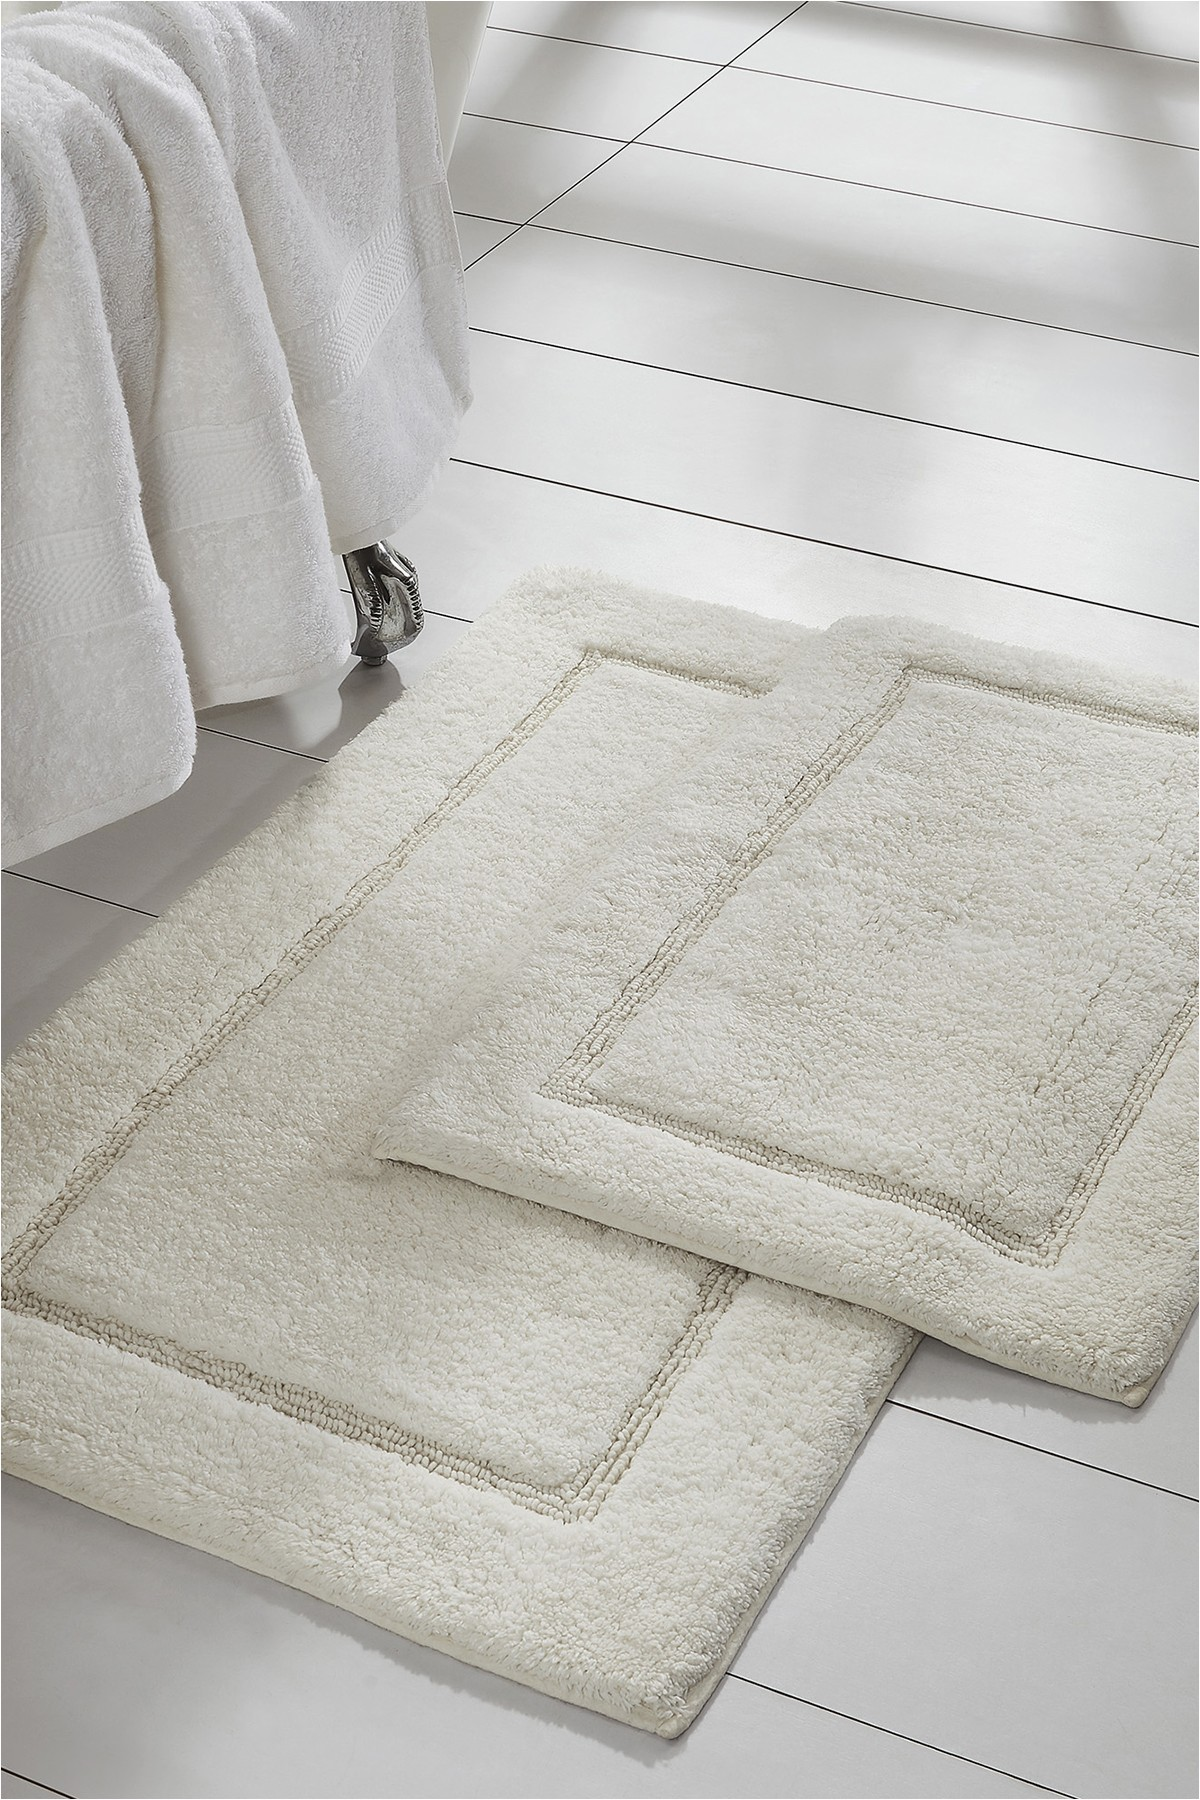 Bathroom Rug Set White Modern Threads White solid Loop Non Slip Bath Mat 2 Piece Set